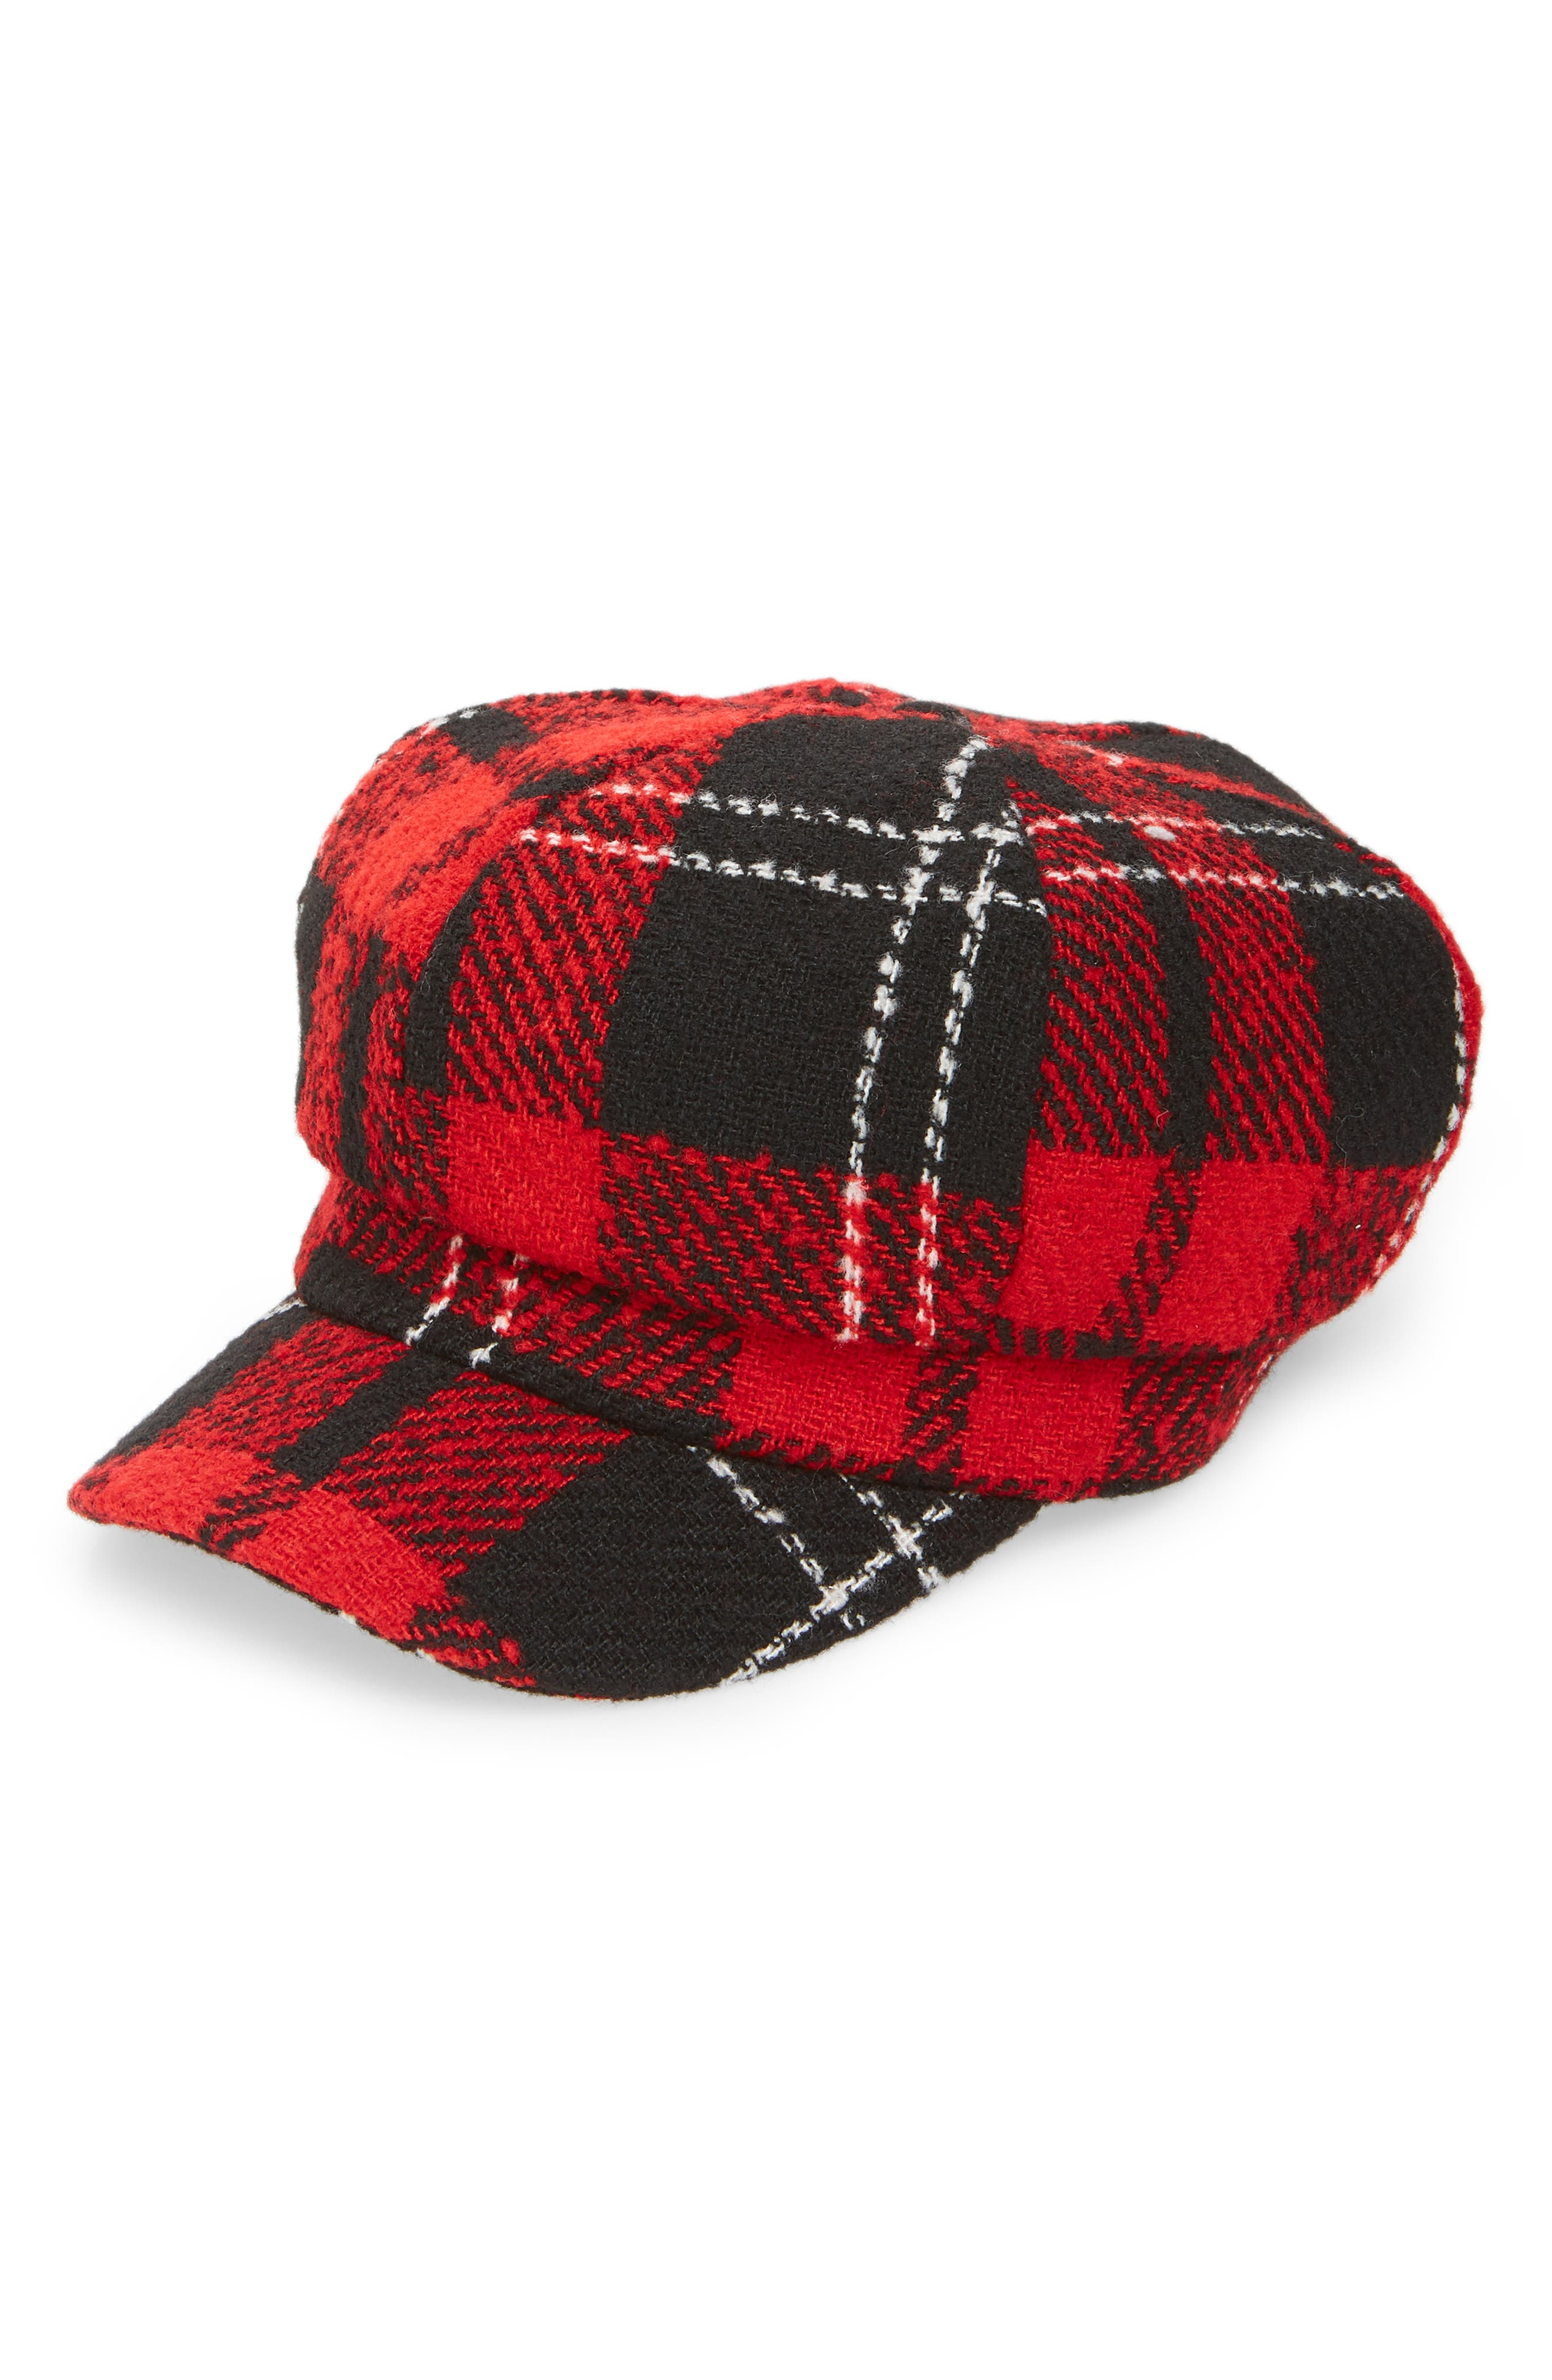 TOPSHOP, Lumberjack Baker Boy Hat, Main thumbnail 1, color, 600